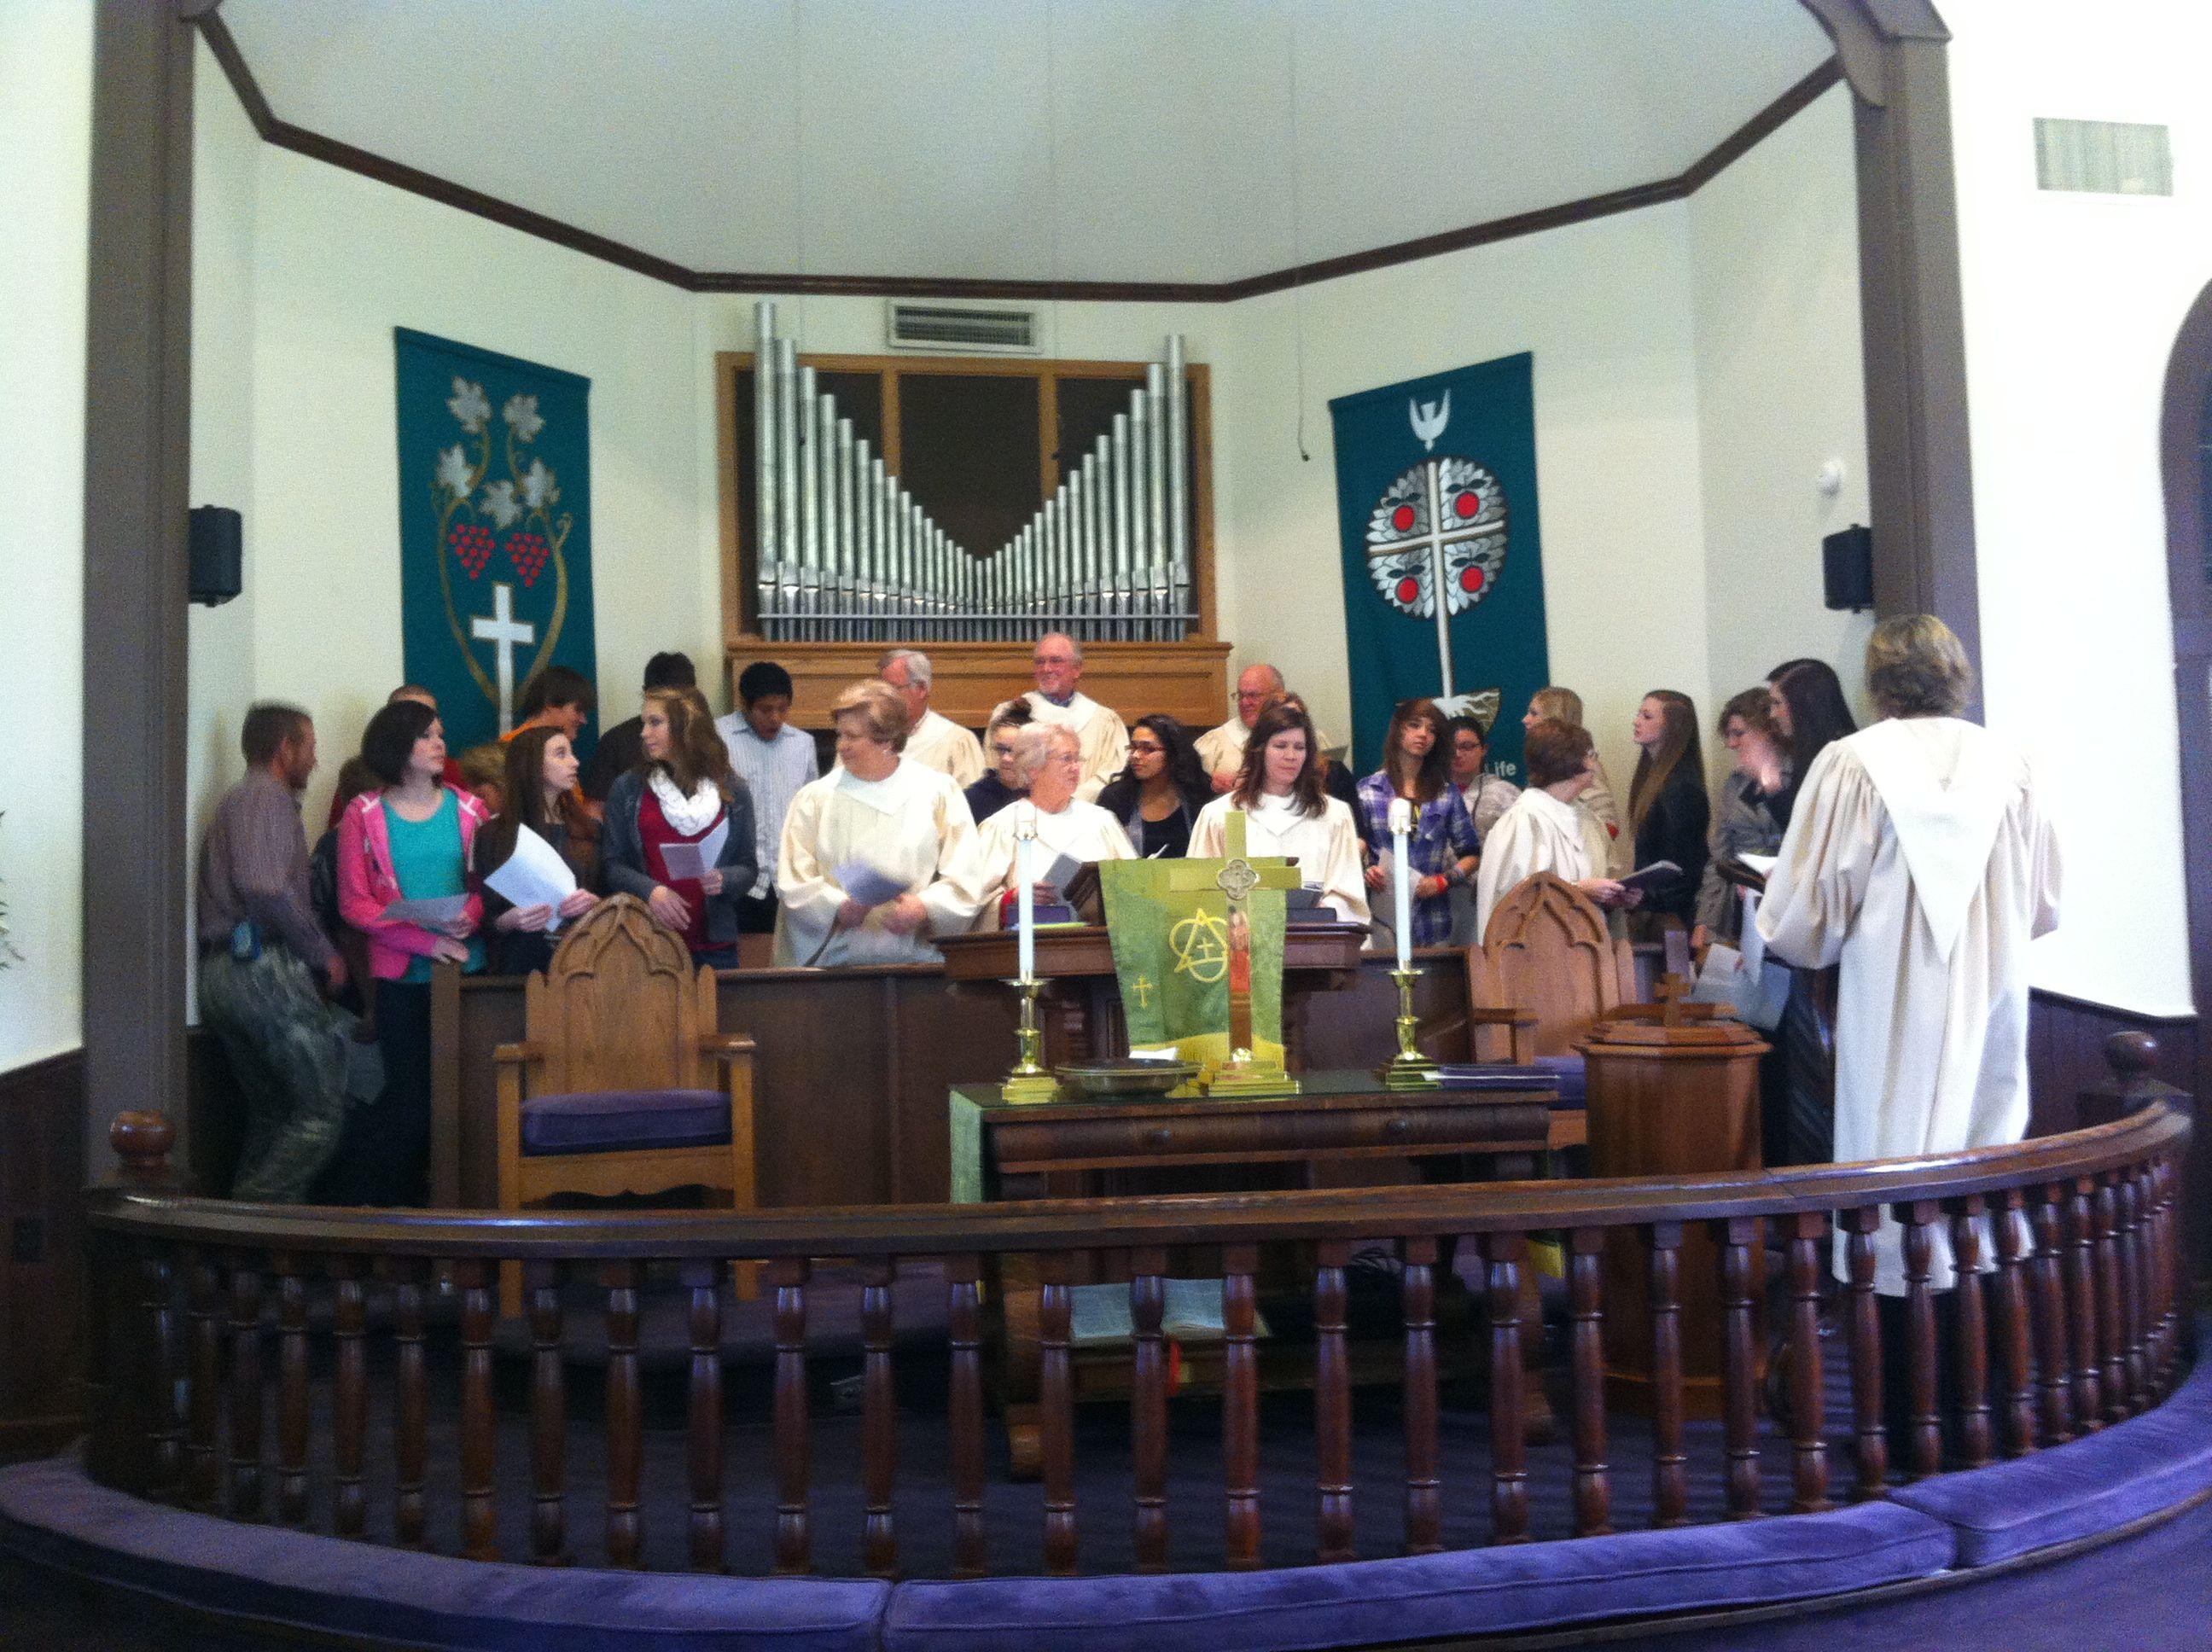 Choir & YOUTH choir joint performance at February 2014